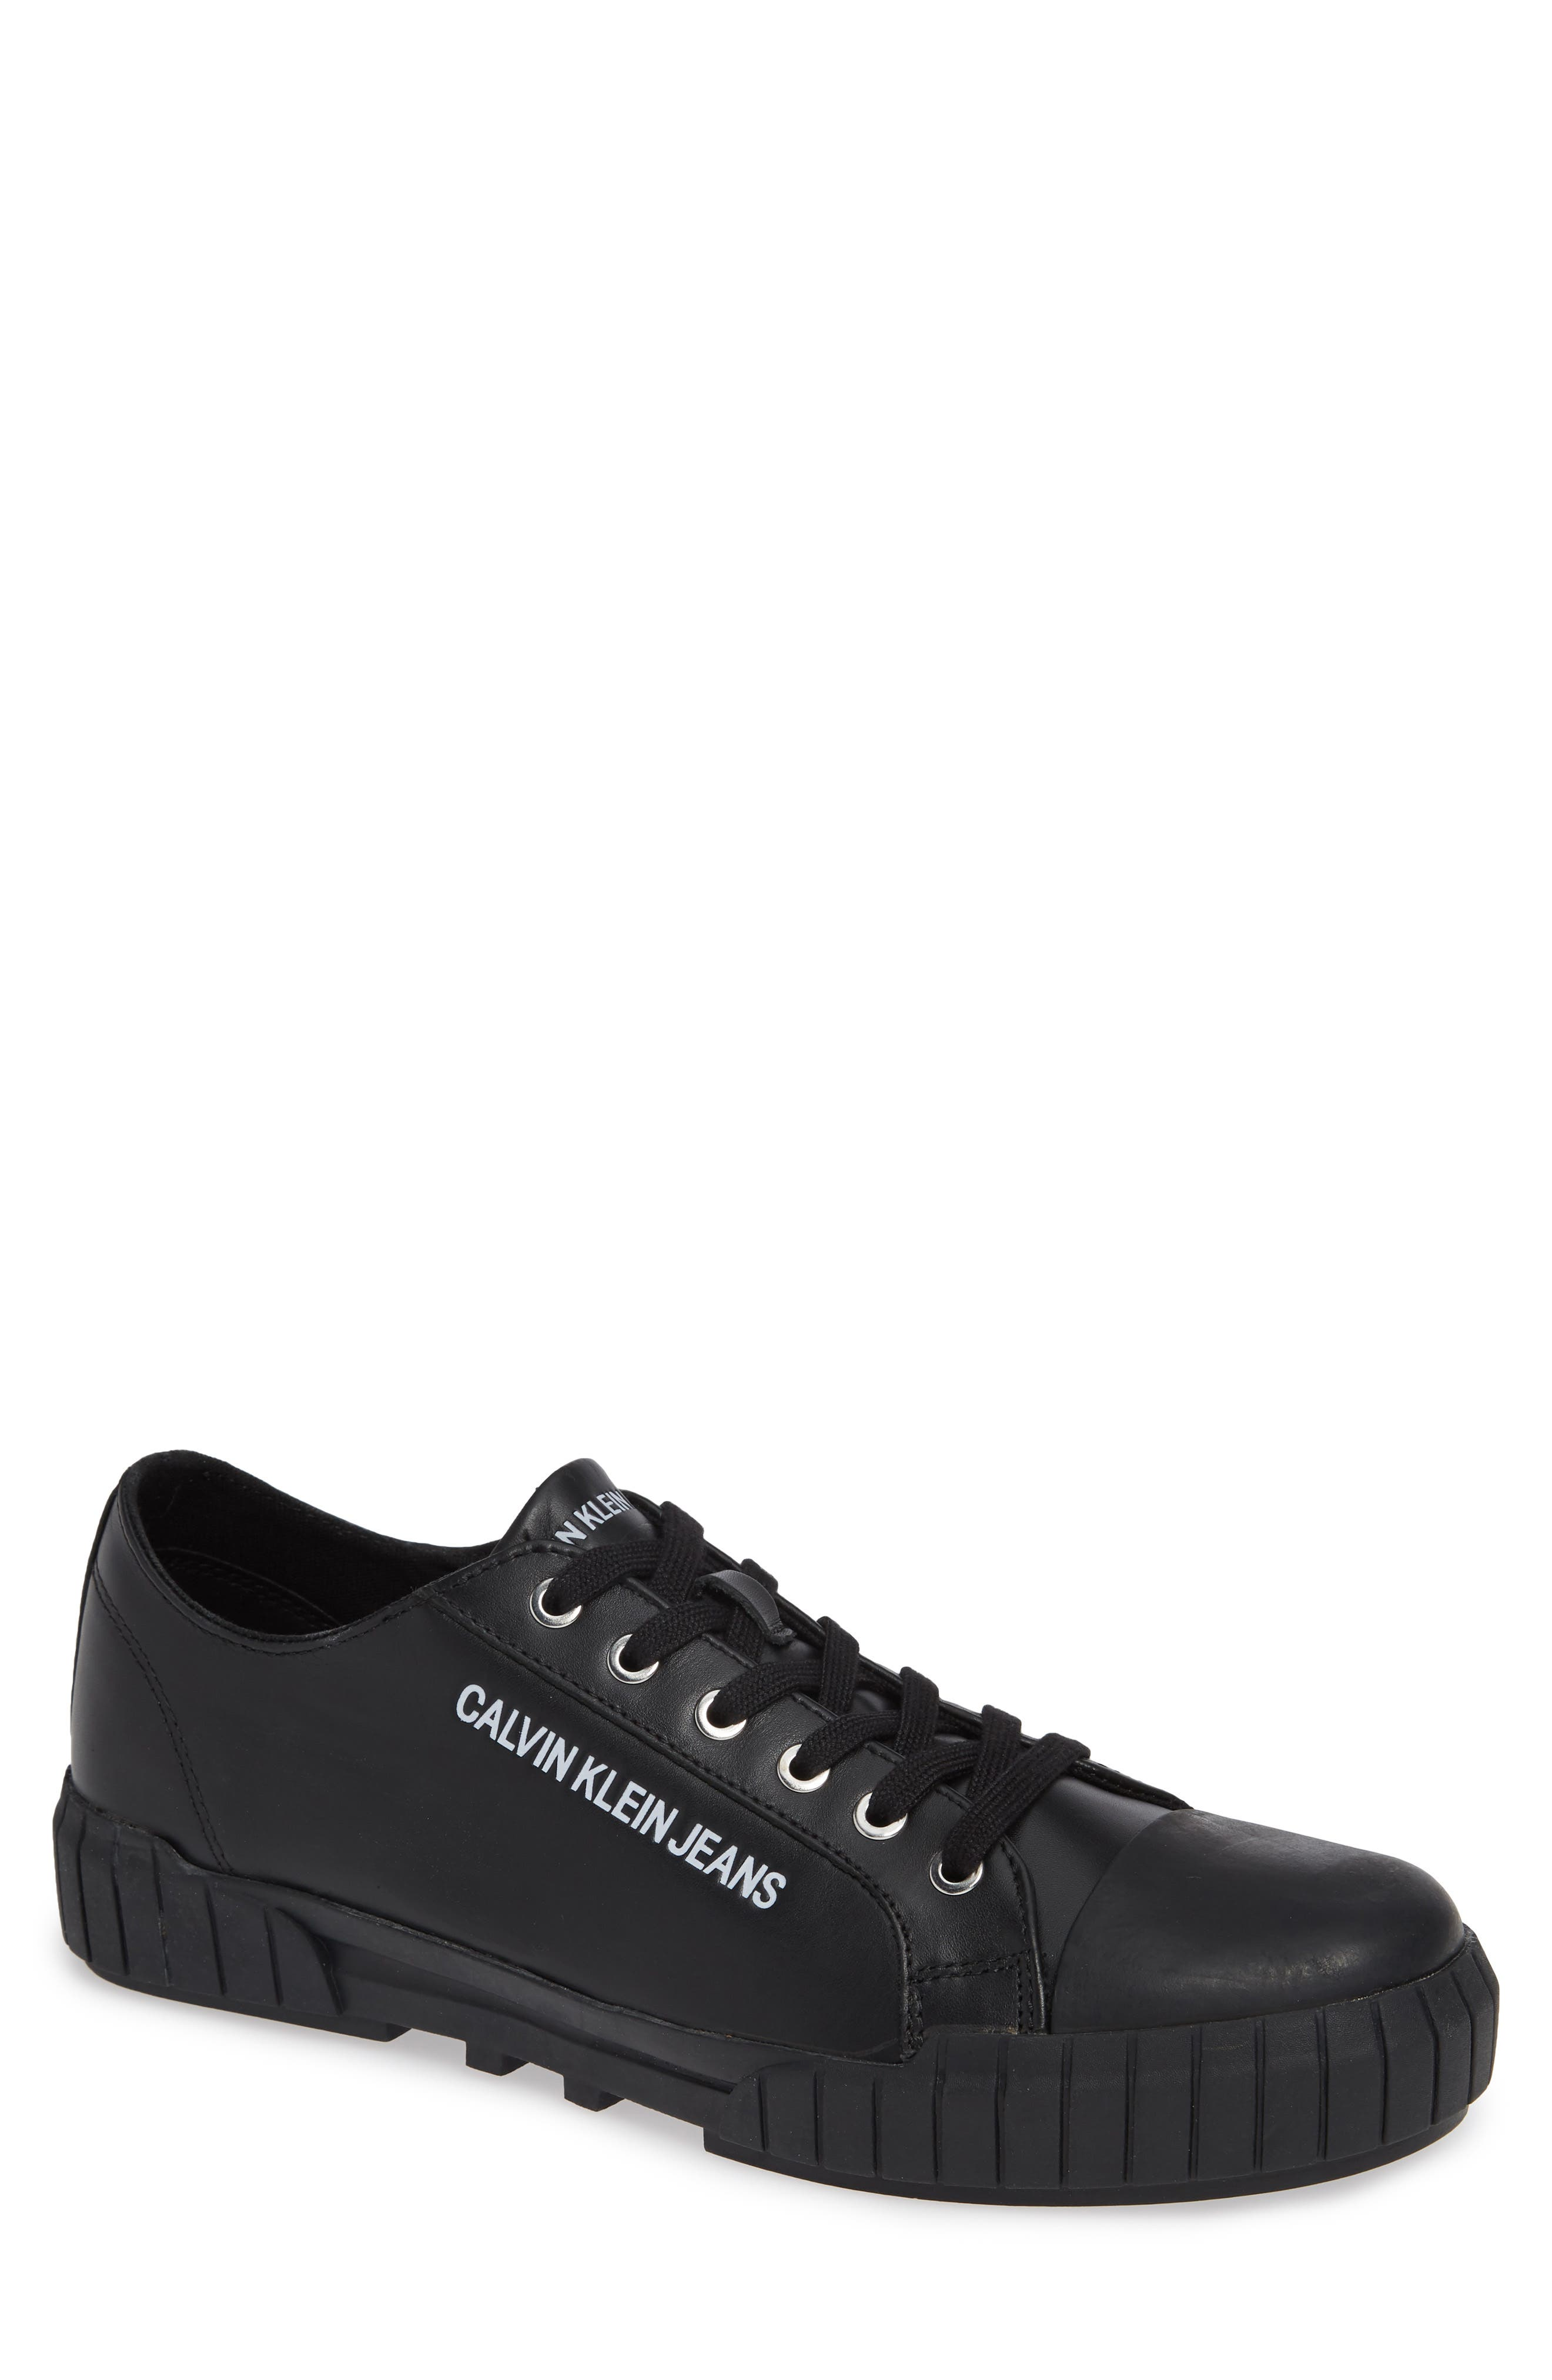 Burton Sneaker,                             Main thumbnail 1, color,                             001